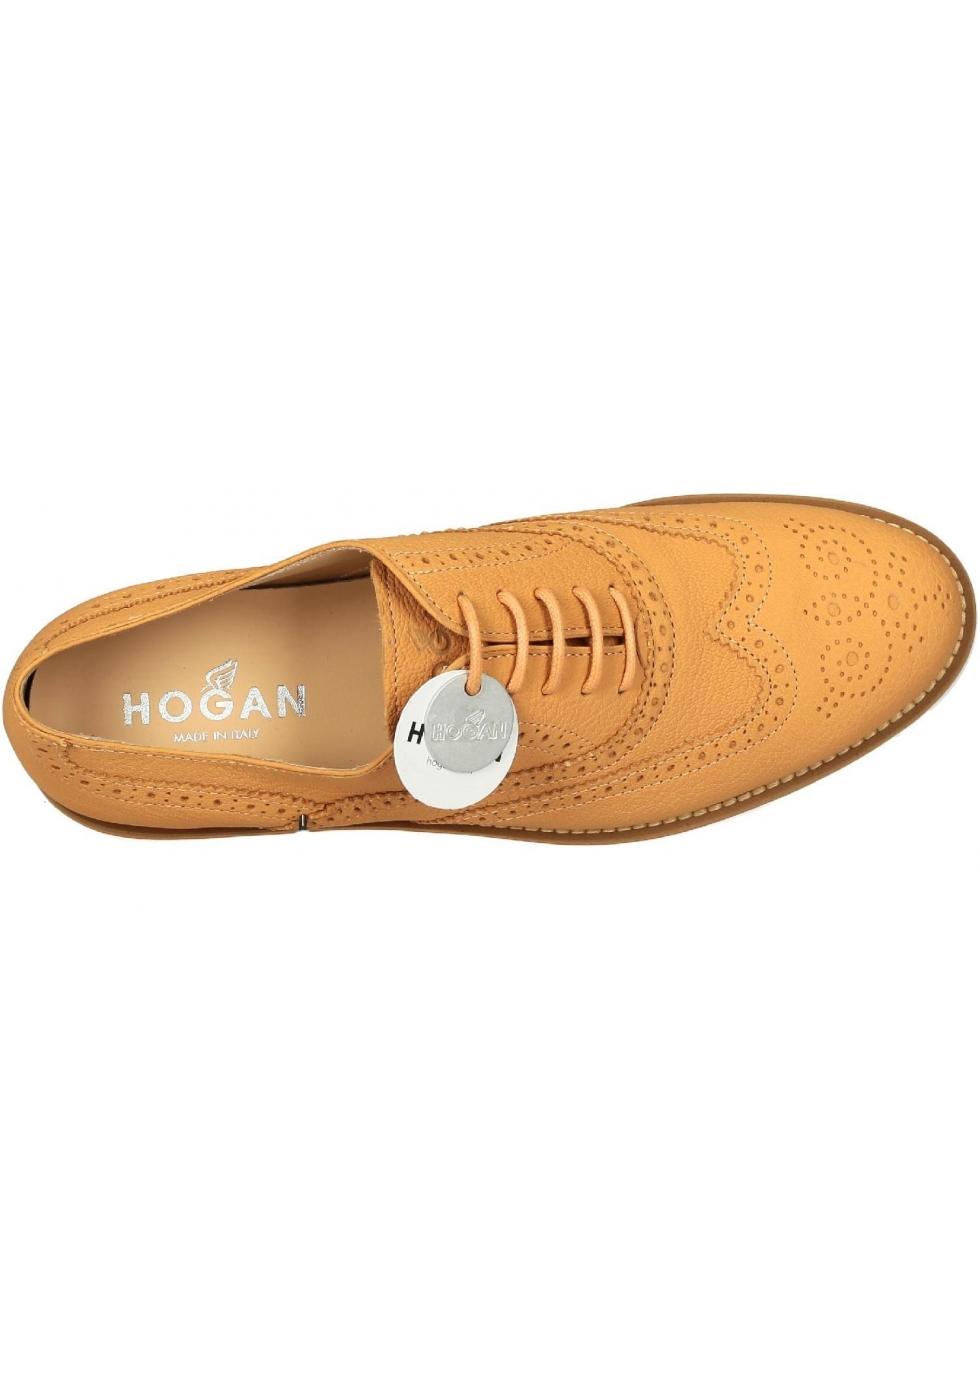 Stringate brogue Hogan donna in pelle arancione - Italian Boutique